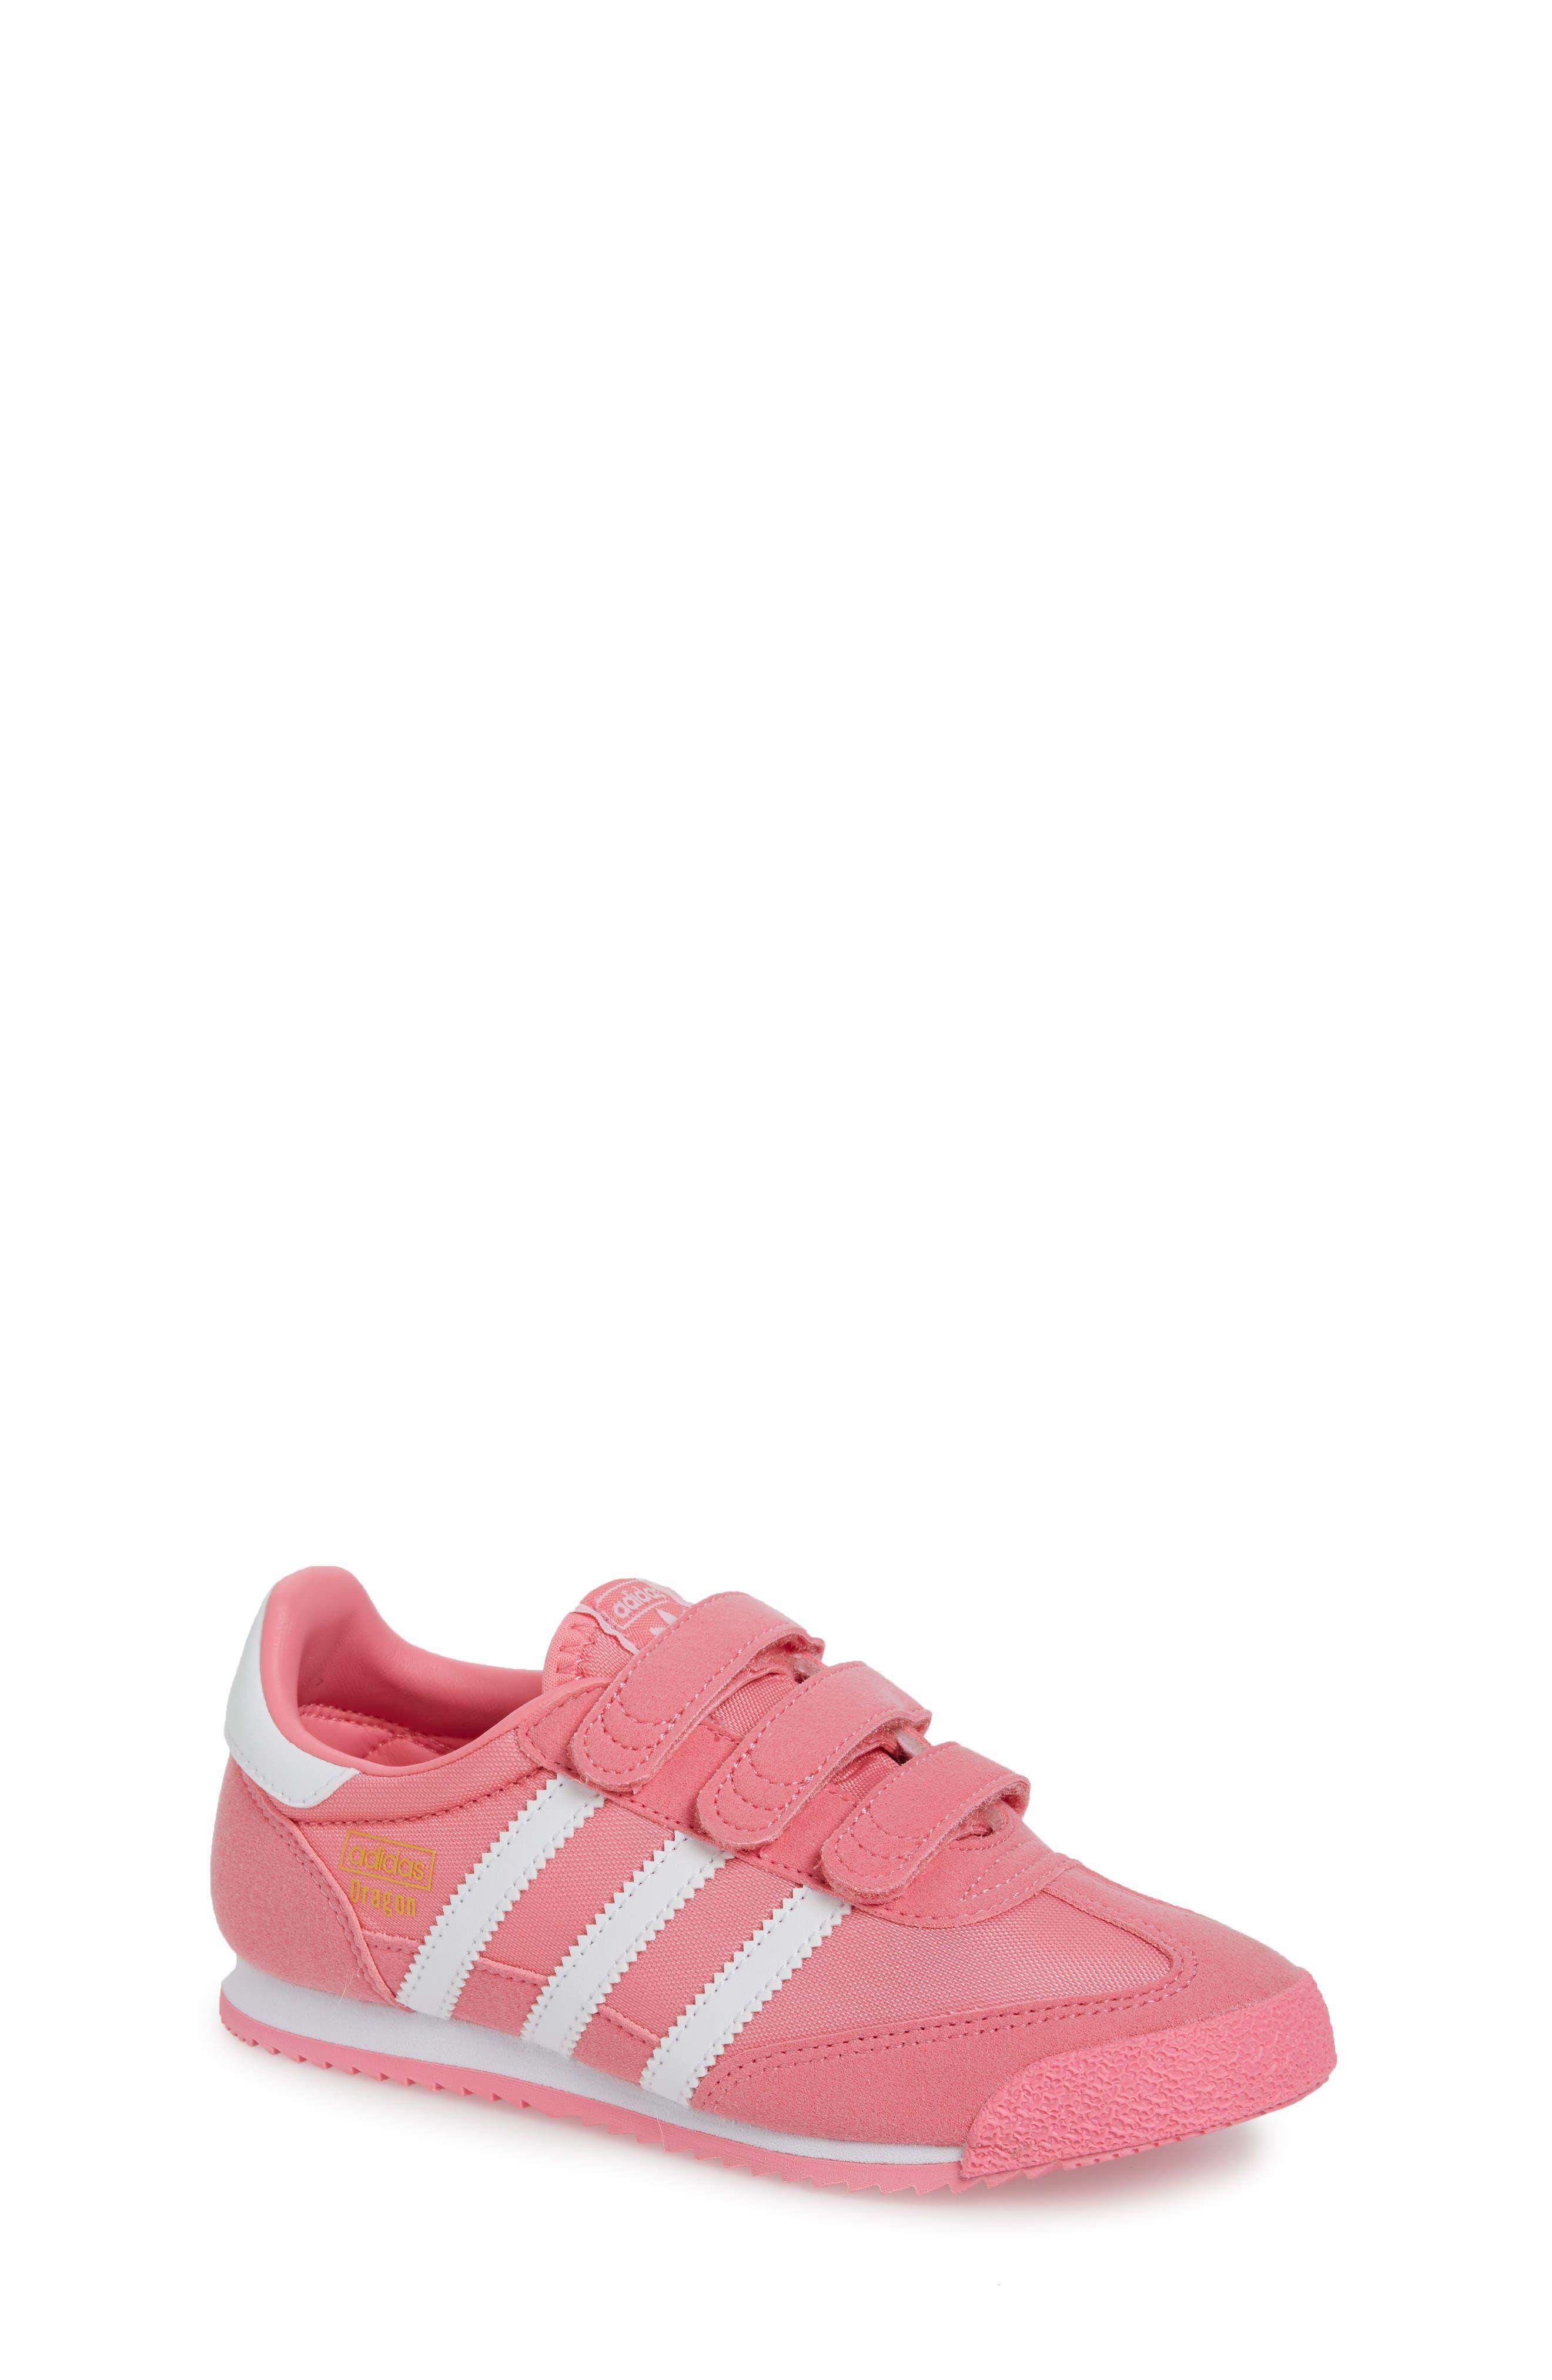 adidas Dragon OG CF Athletic Shoe (Toddler & Little Kid)